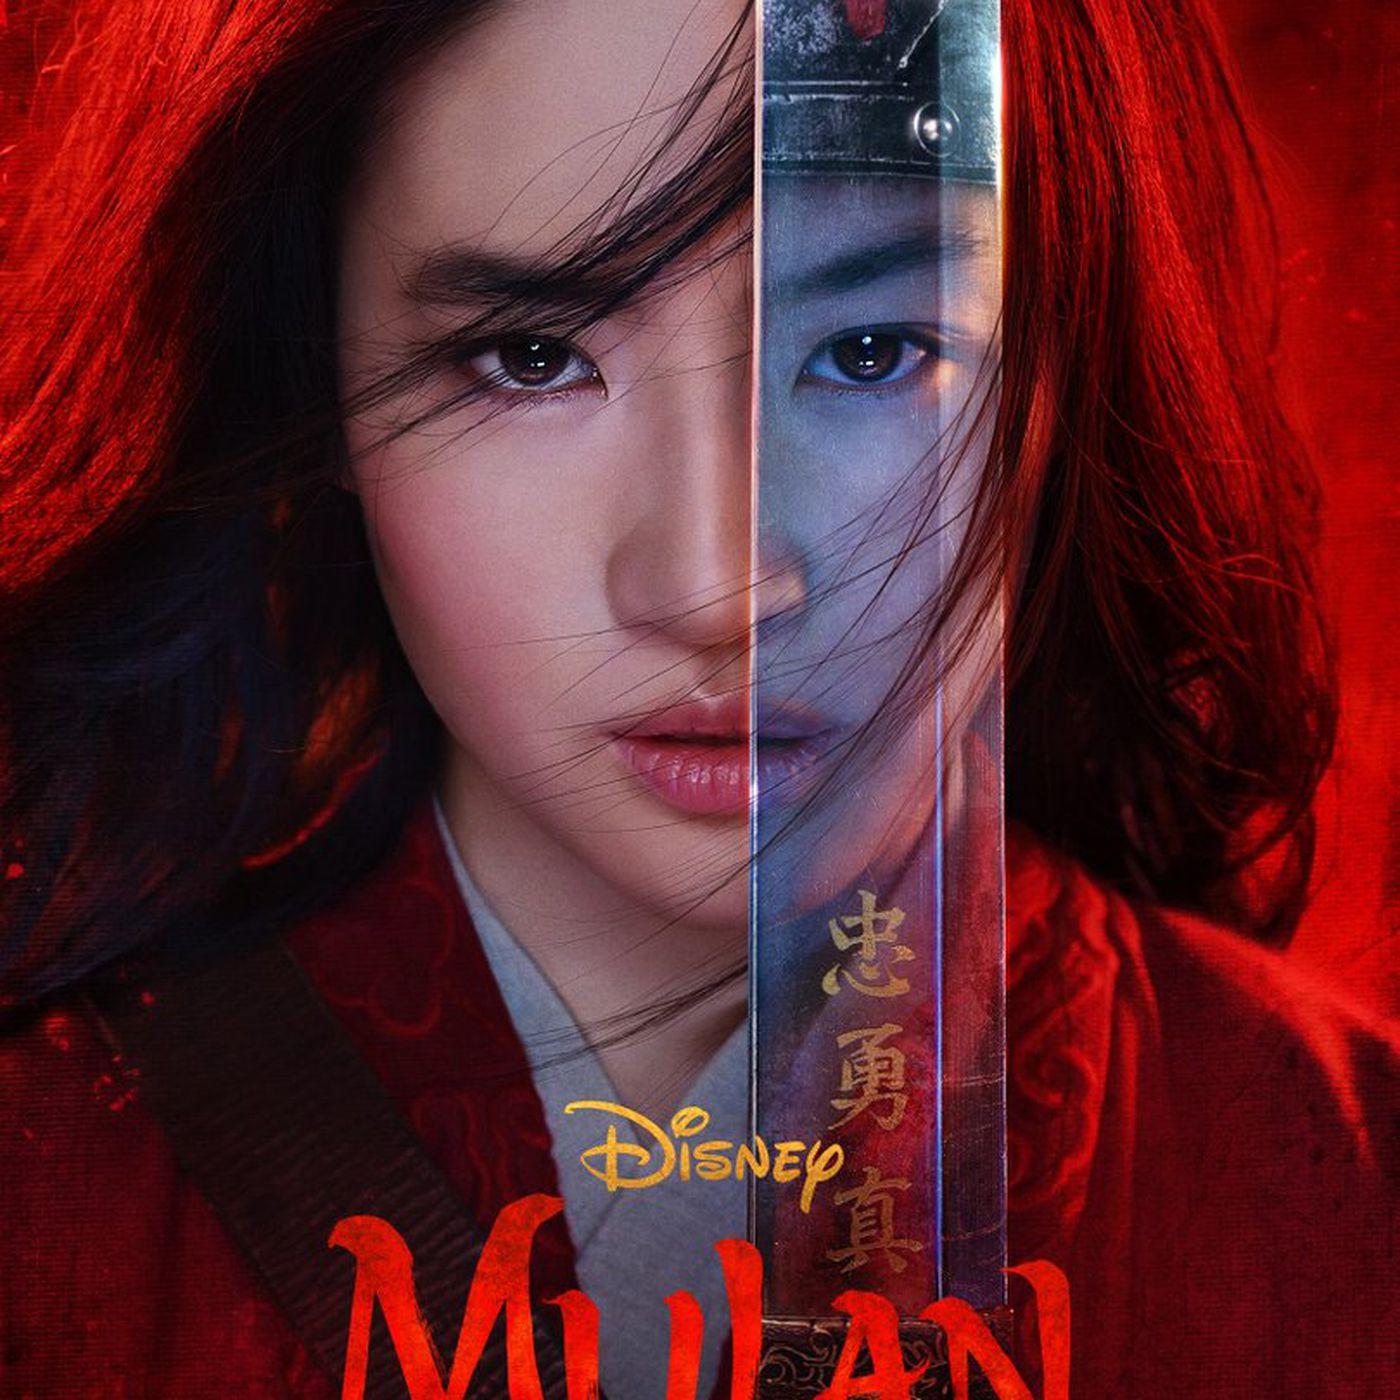 Disney S Mulan Live Action Trailer Less Music More Action Vox